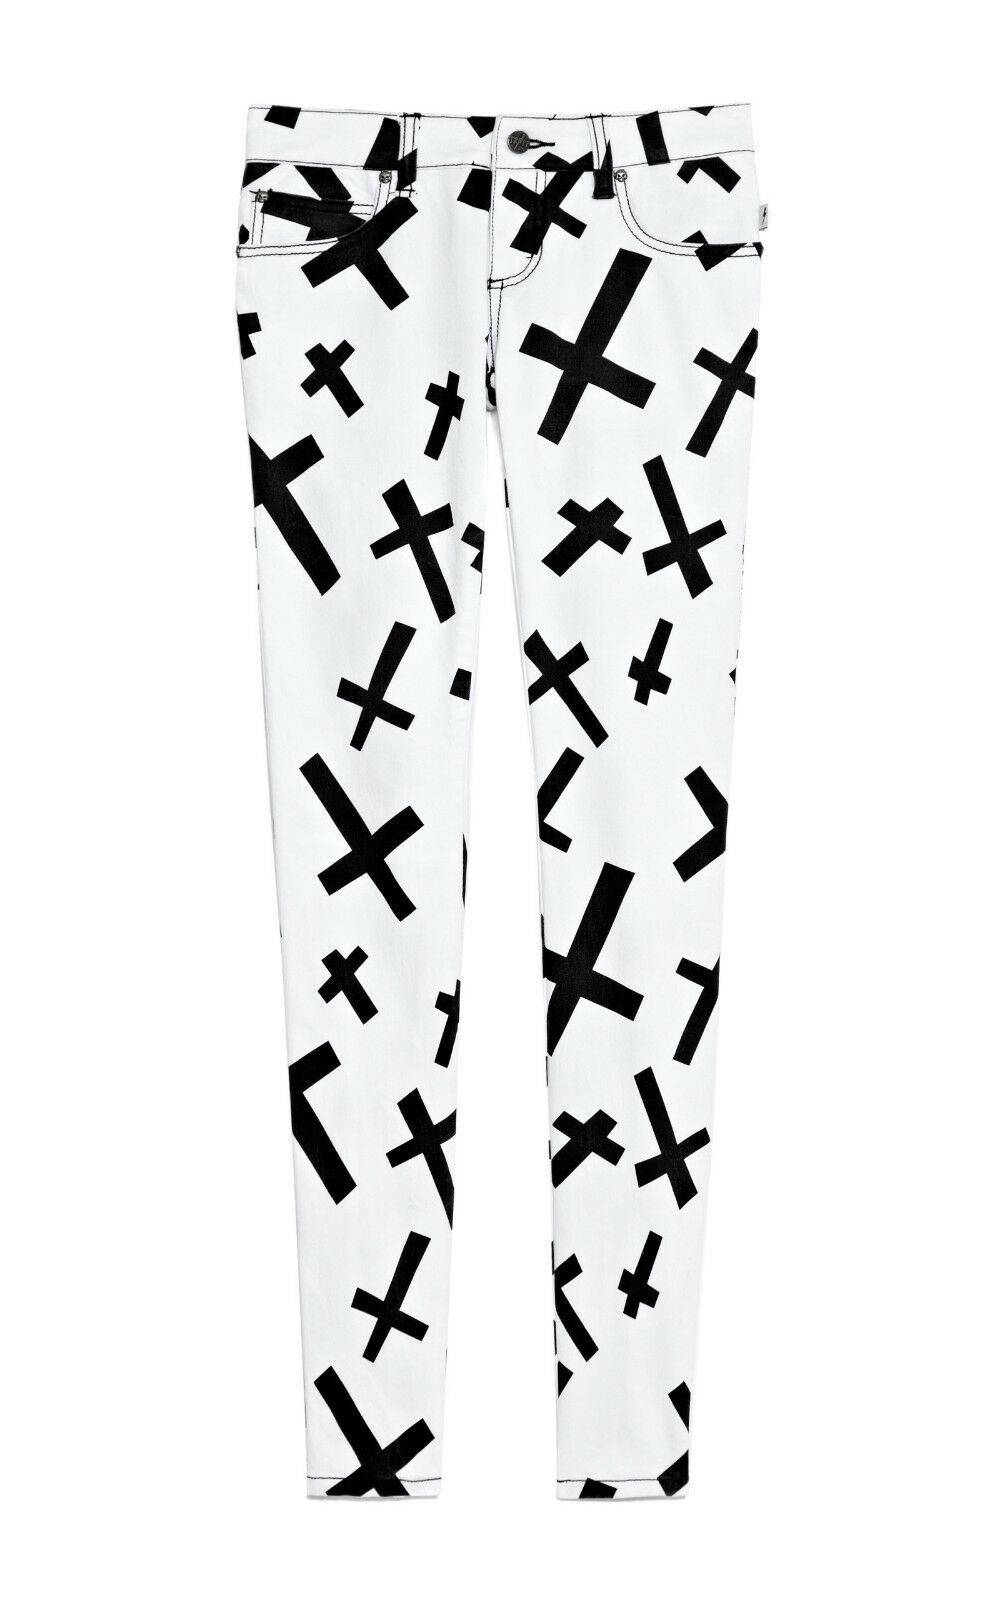 TRIPP EMO GOTH PUNK ROCKER WHITE/BLACK CROSSES JEAN PANTS SKINNY METAL IS6235P Clothing, Shoes & Accessories